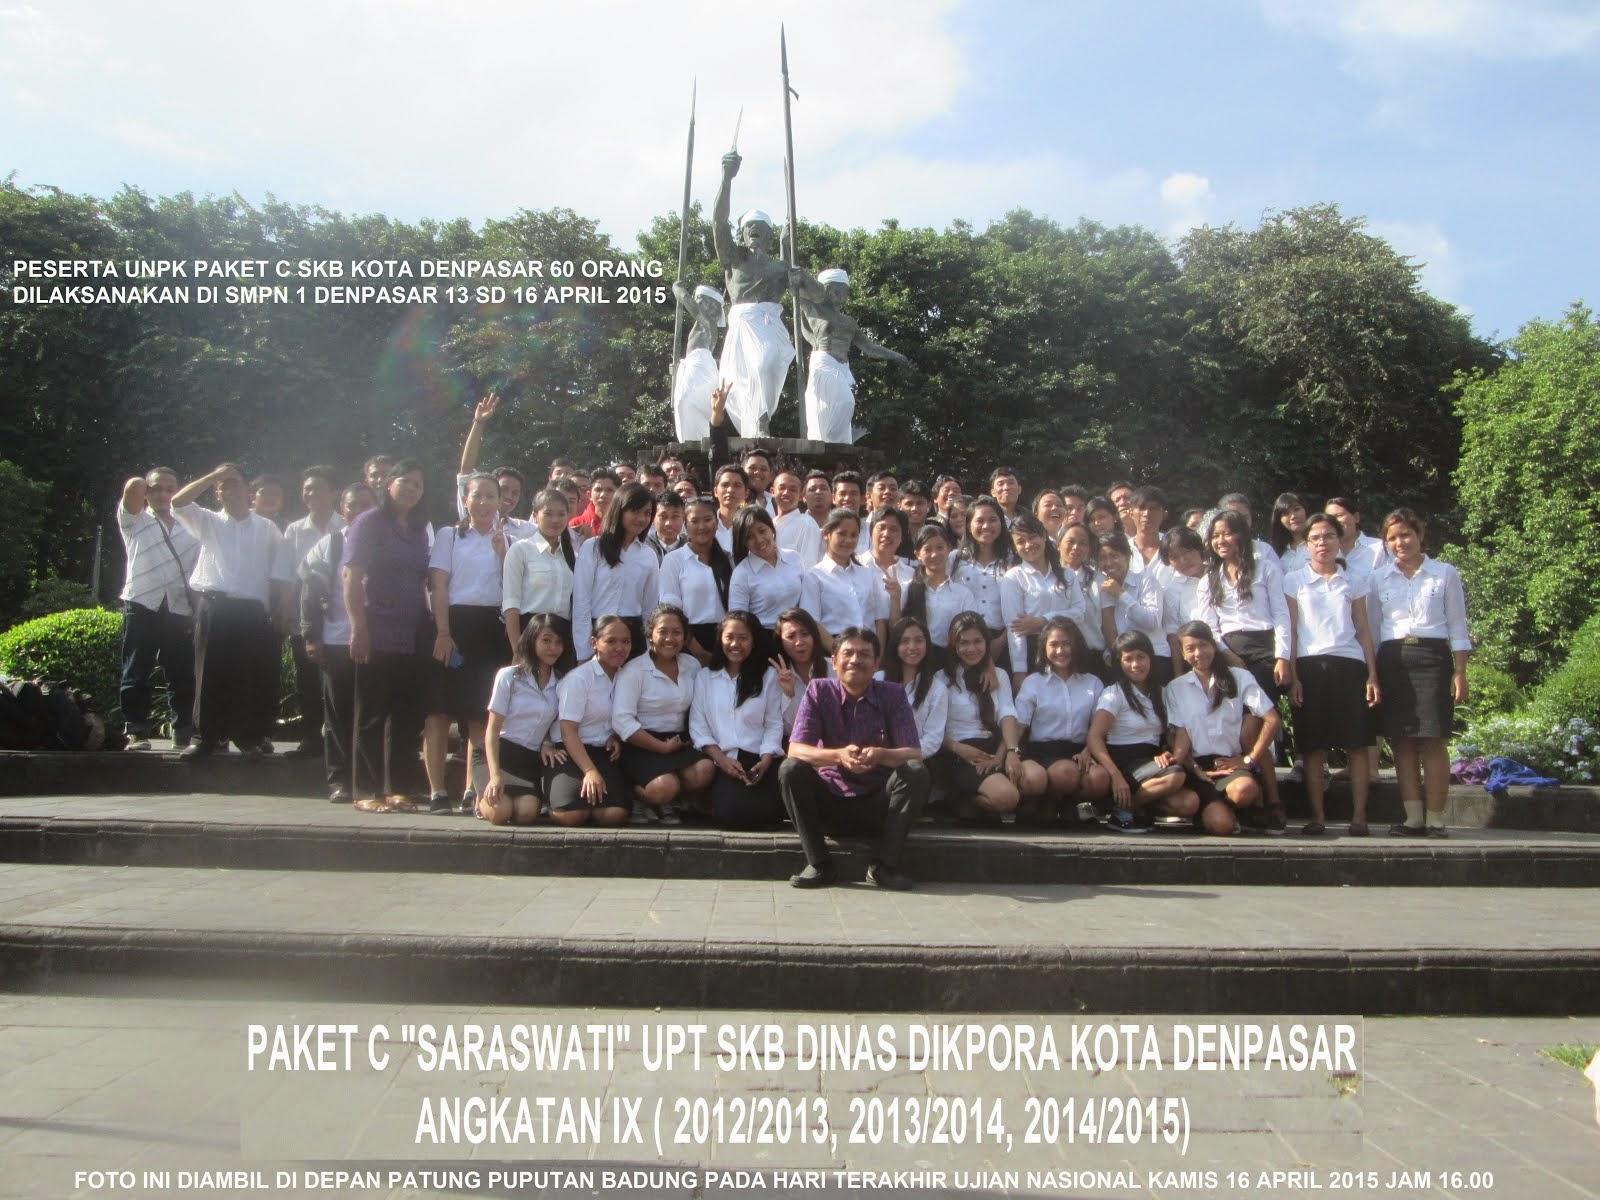 PAKET C ANGKATAN IX ( 2012/2013, 2013/2014, 2014/2015 )